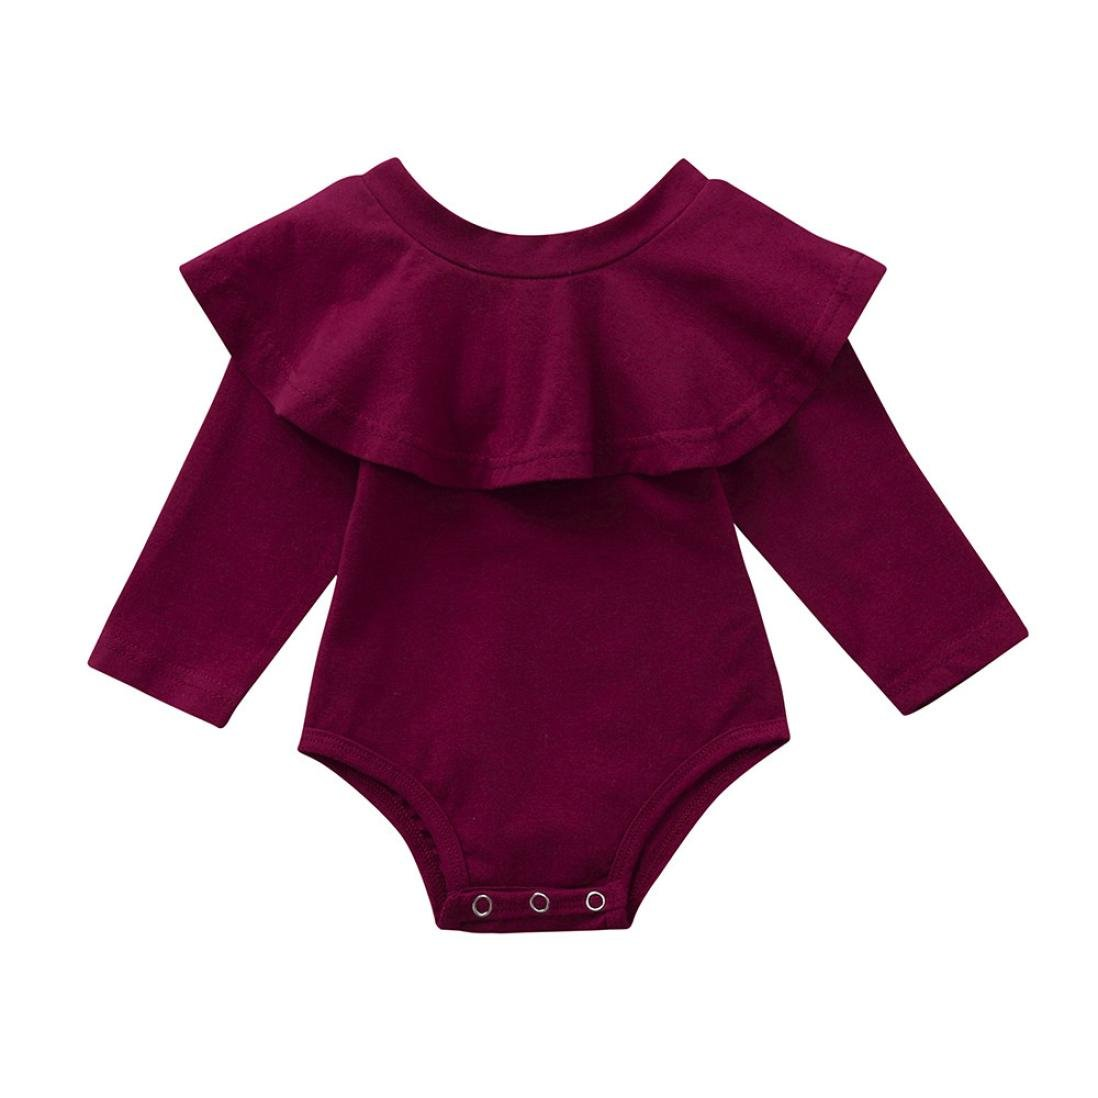 Jchen(TM) Newborn Infant Baby Girls Long Sleeve Floral Ruffles Romper Jumpsuit Clothes Playsuit Sleepsuit for 0-24 Months